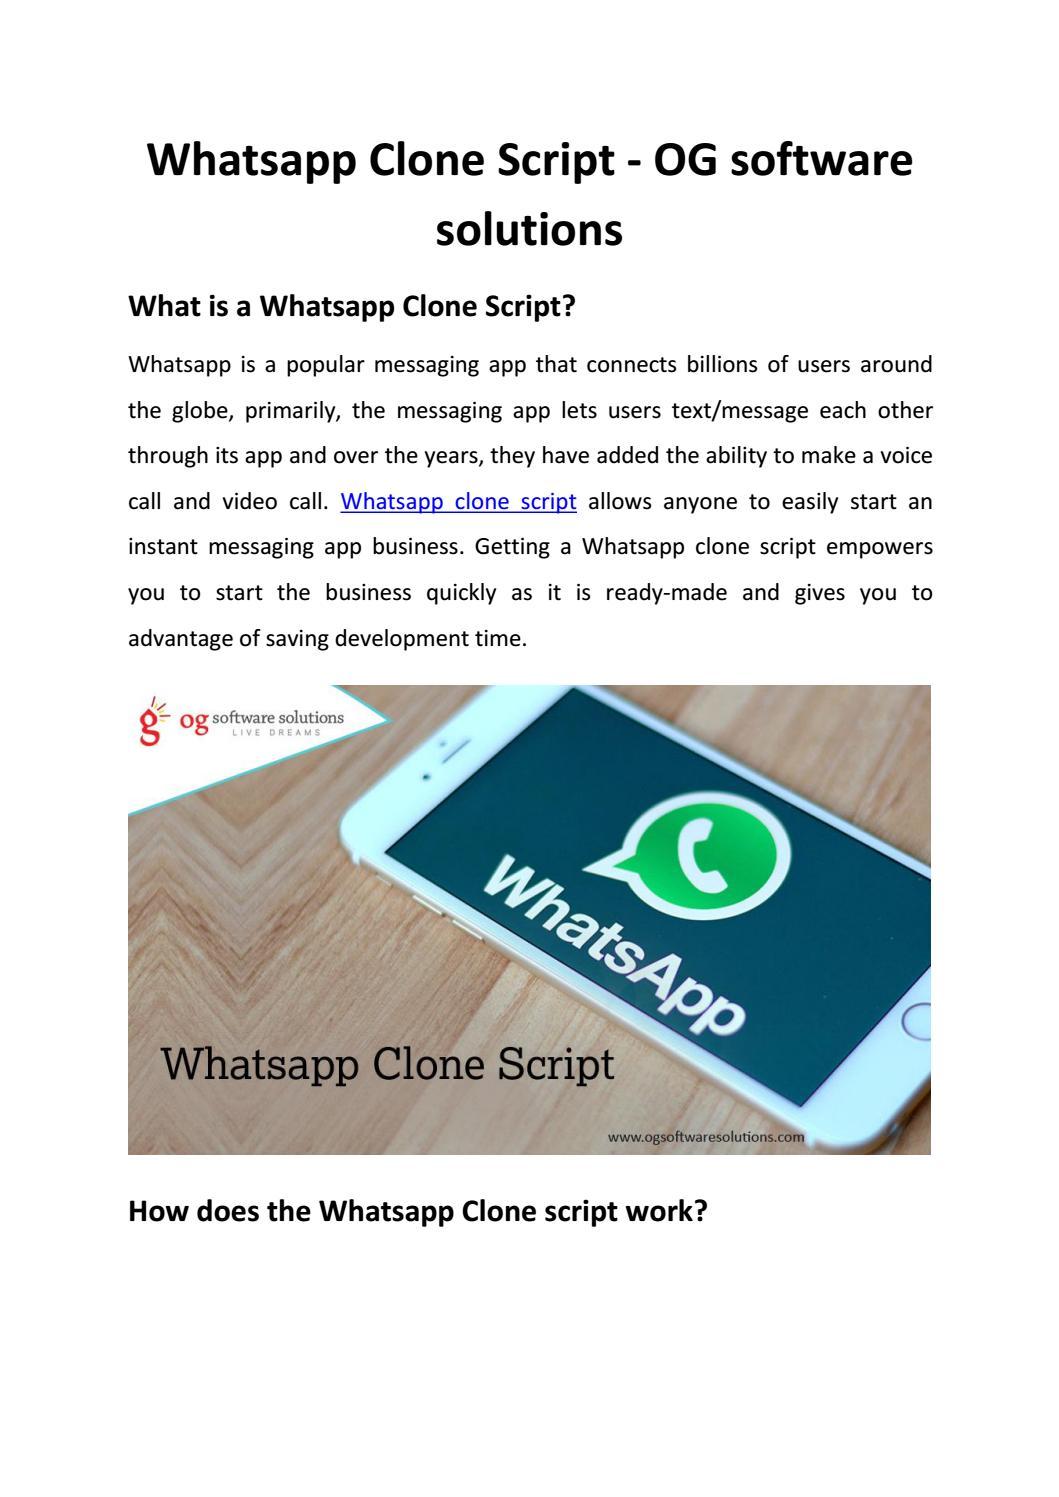 Whatsapp Clone Script Og Software Solutions By Ogsoftwaresolutionspvtltd Issuu